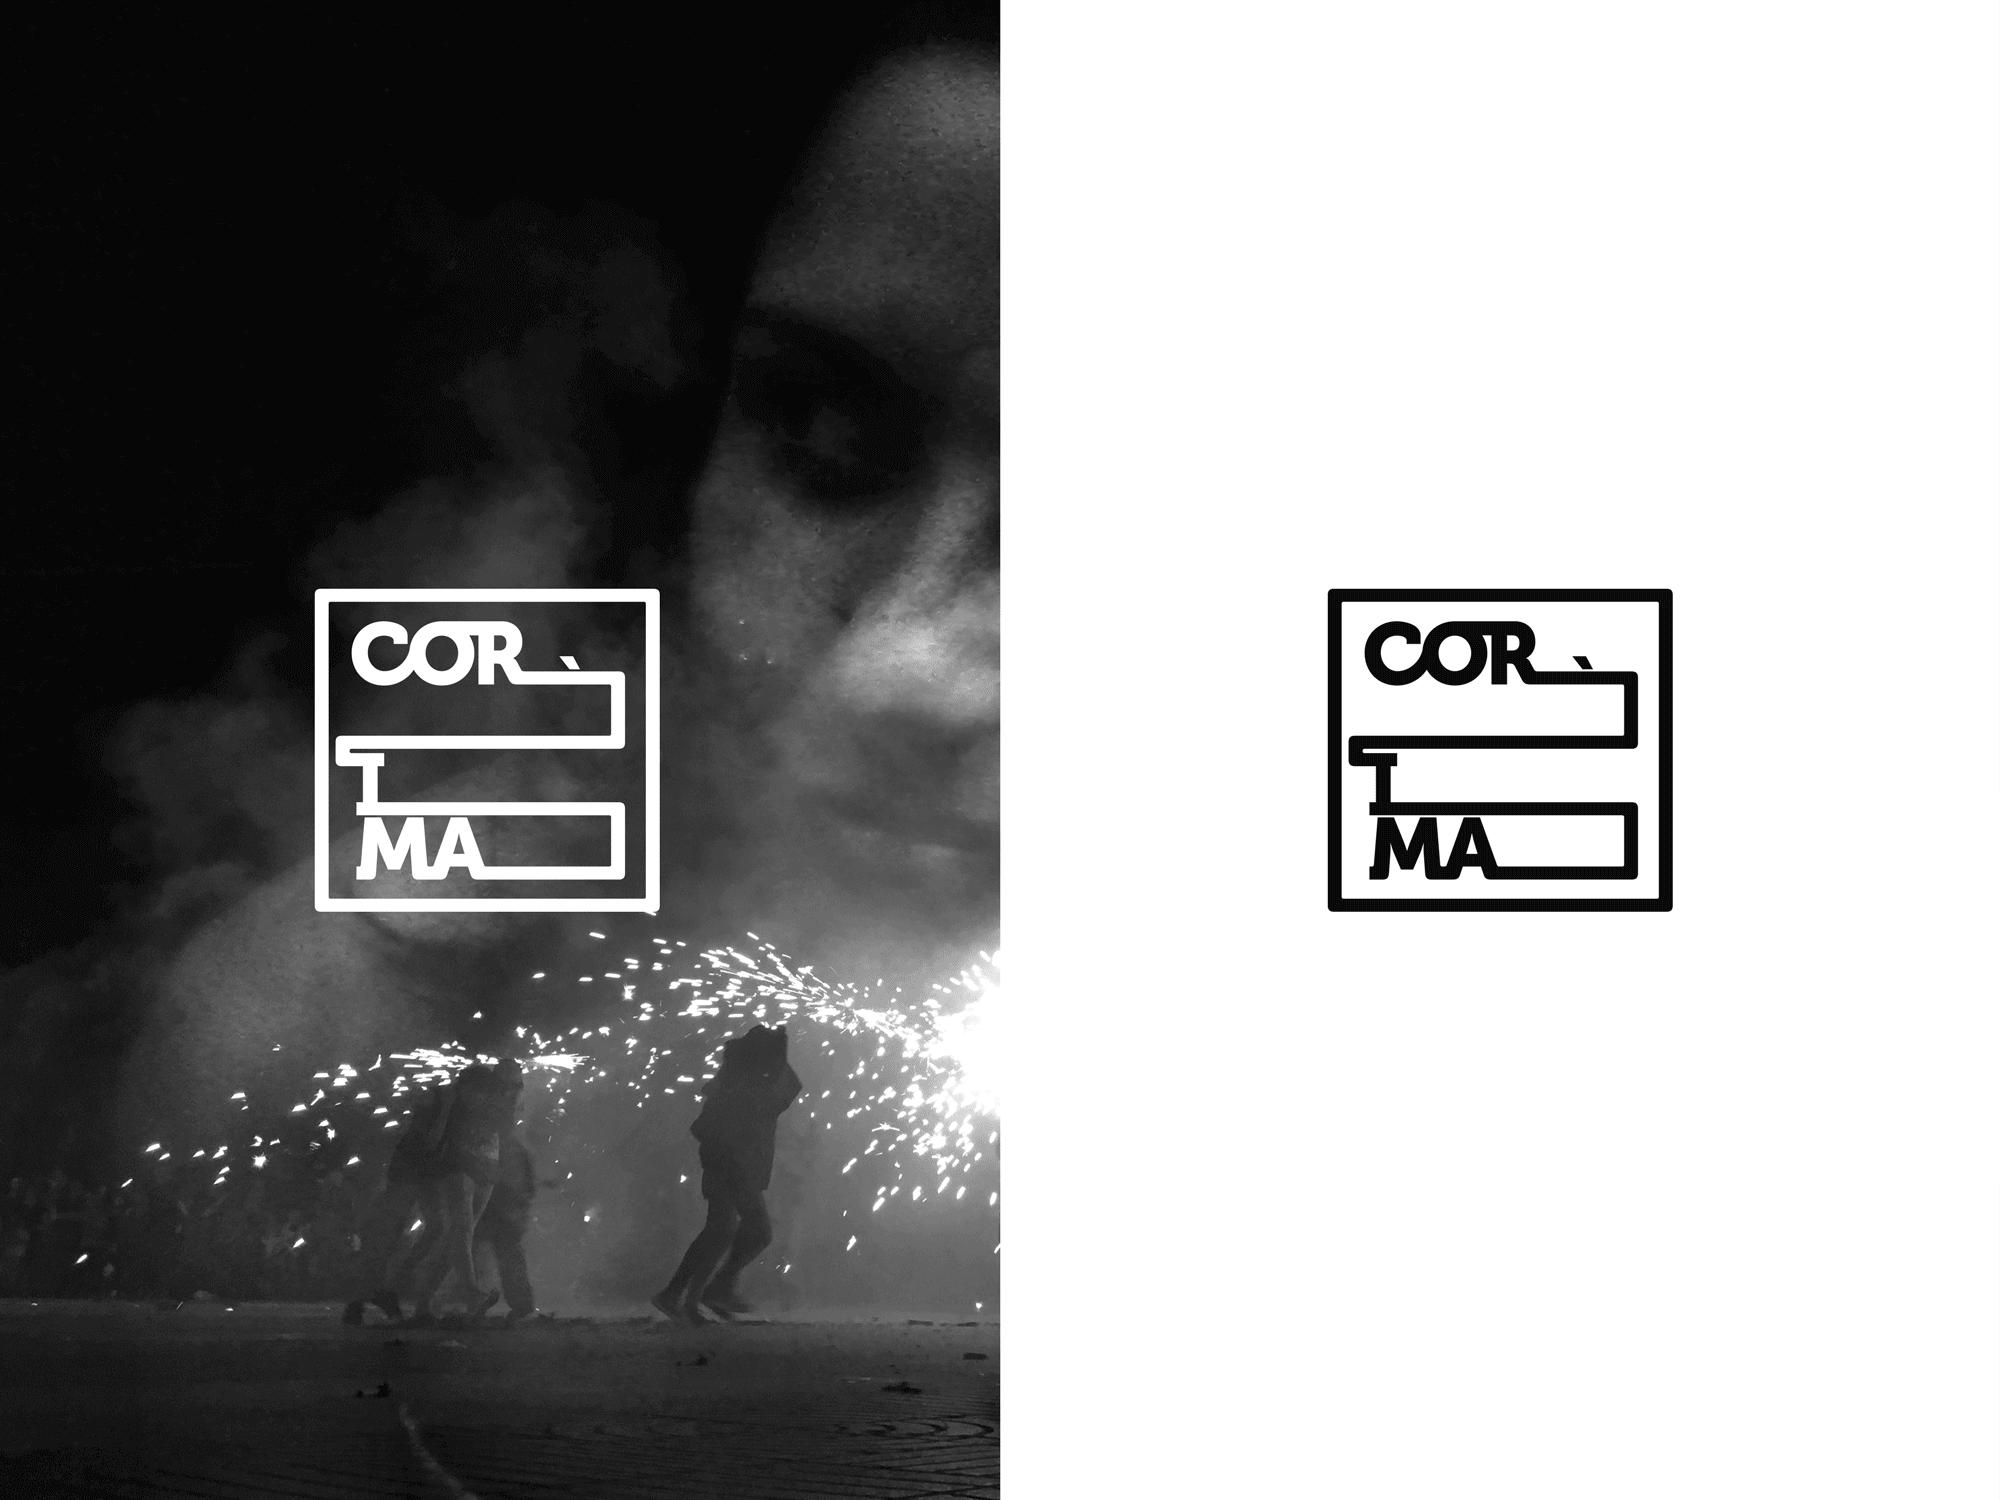 Cornellà Informa, Revista, Magazine, la Negreta, Logotip, Branding, Marca